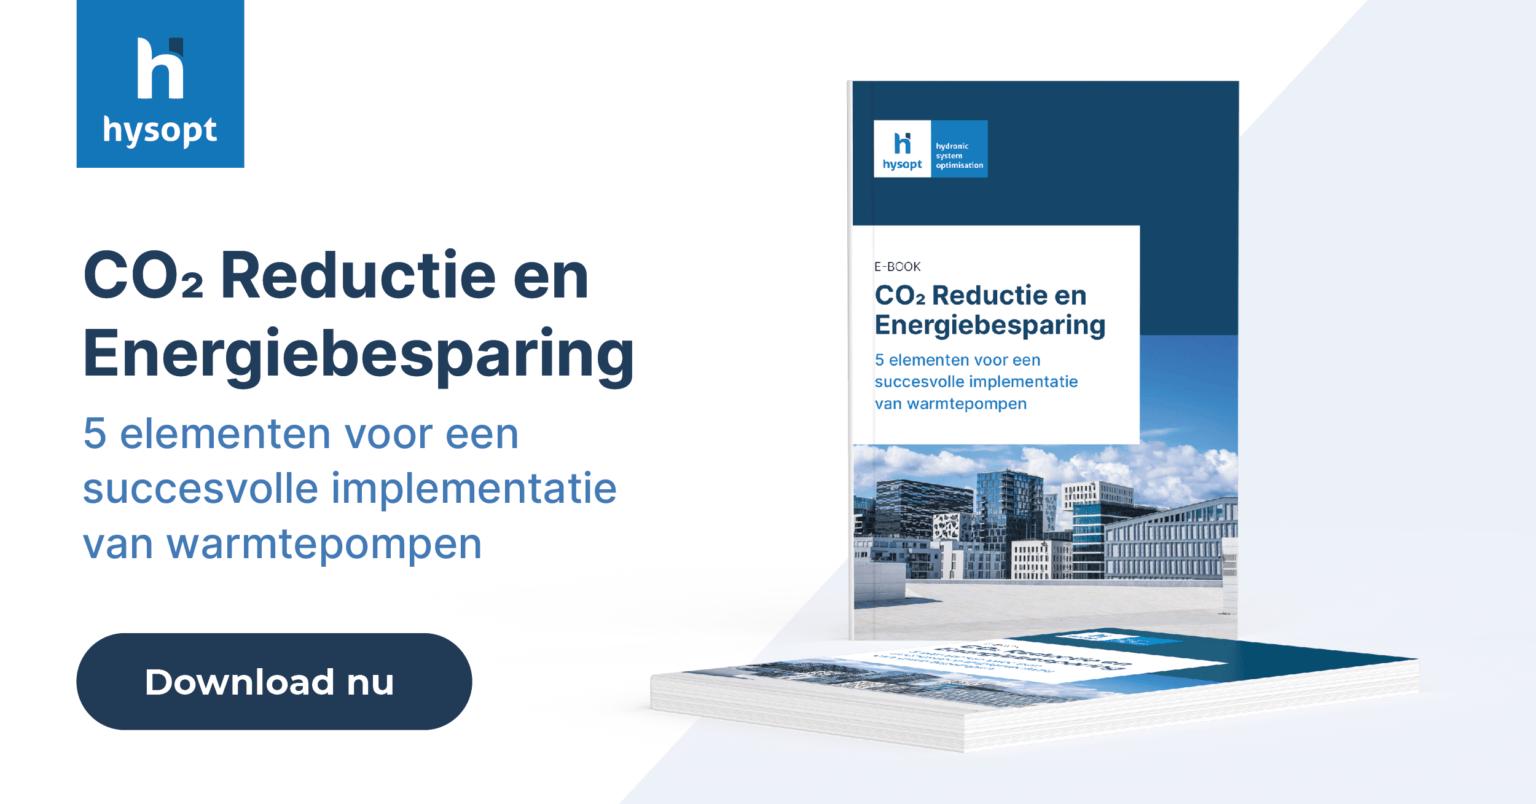 Hysopt - Ebook CO2 Reductie en Energiebesparing